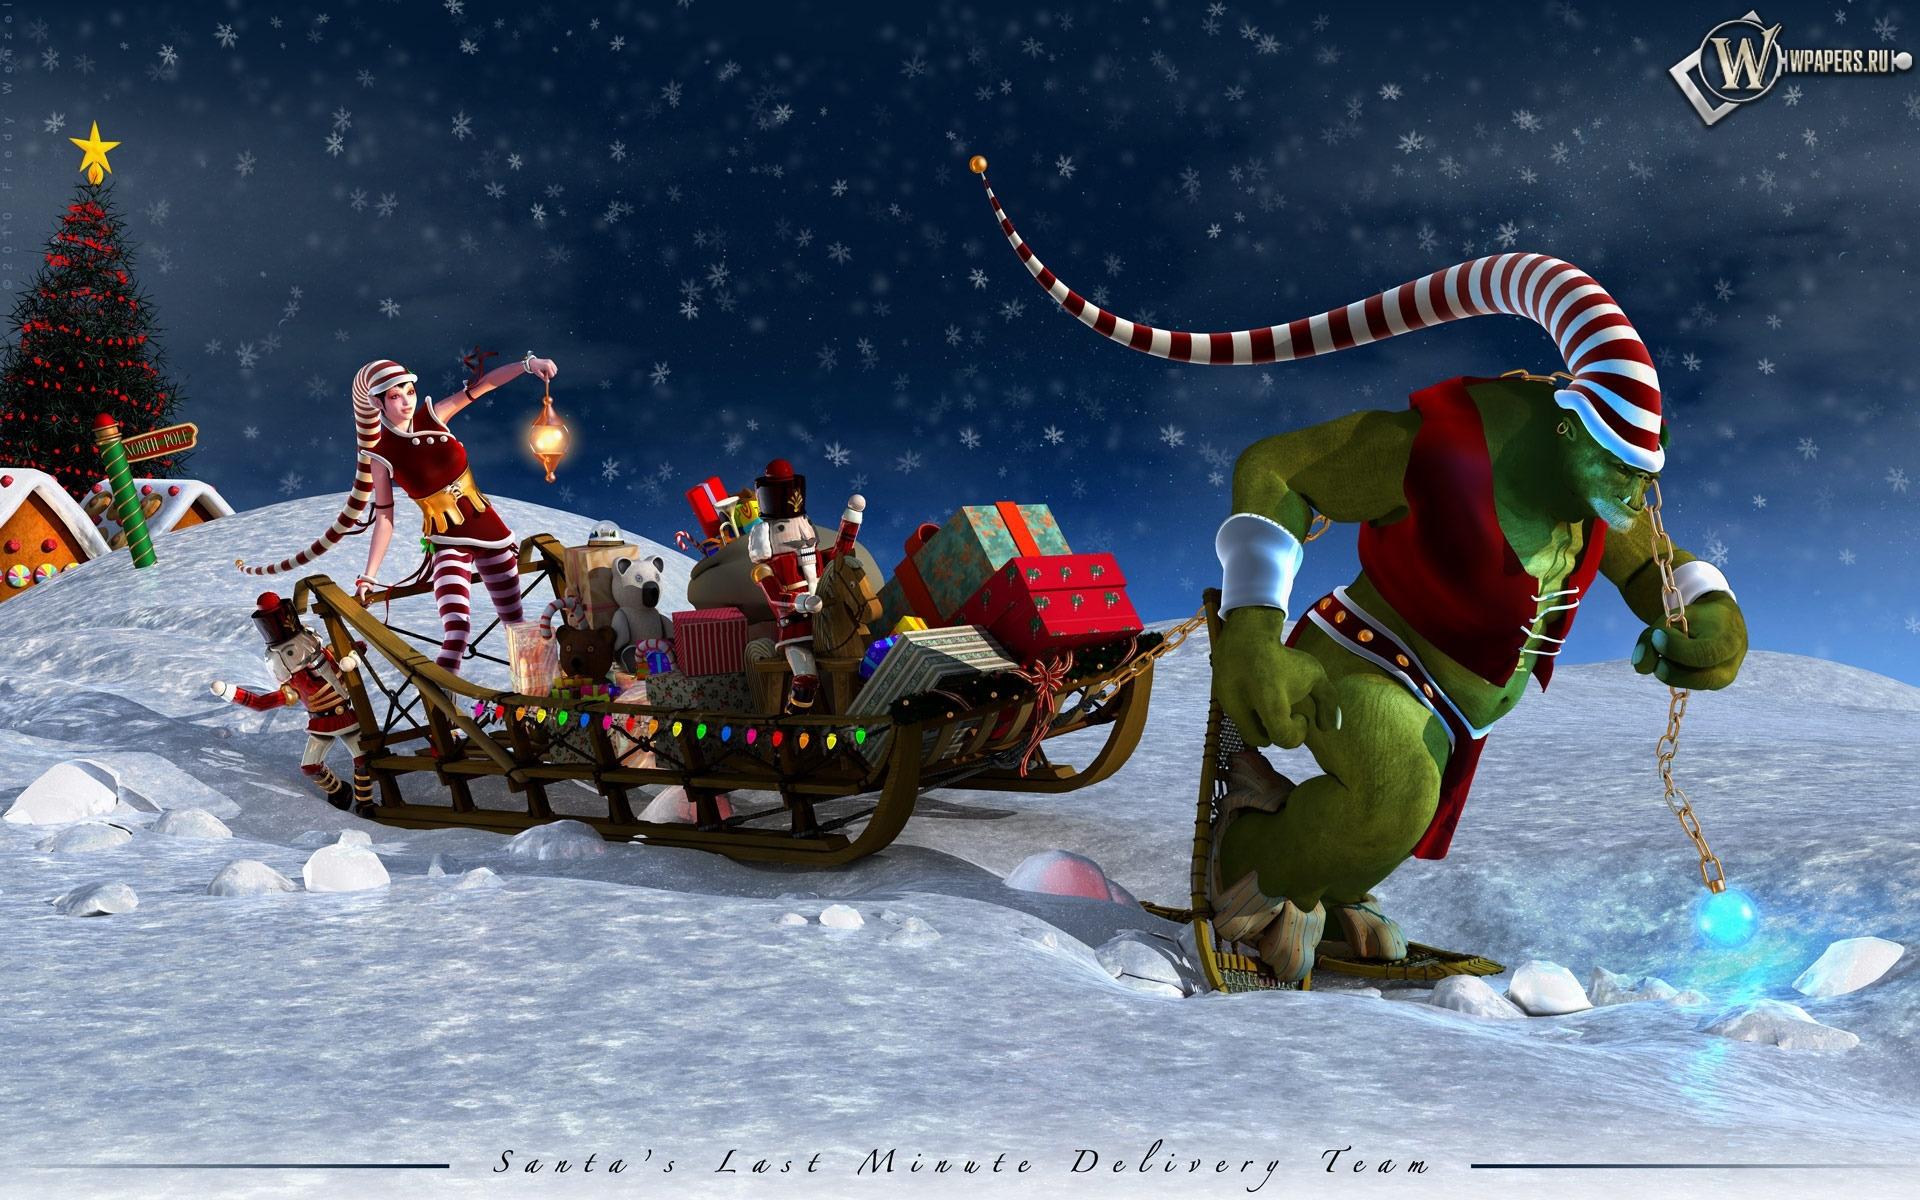 Санта-Клаус на санях 1920x1200